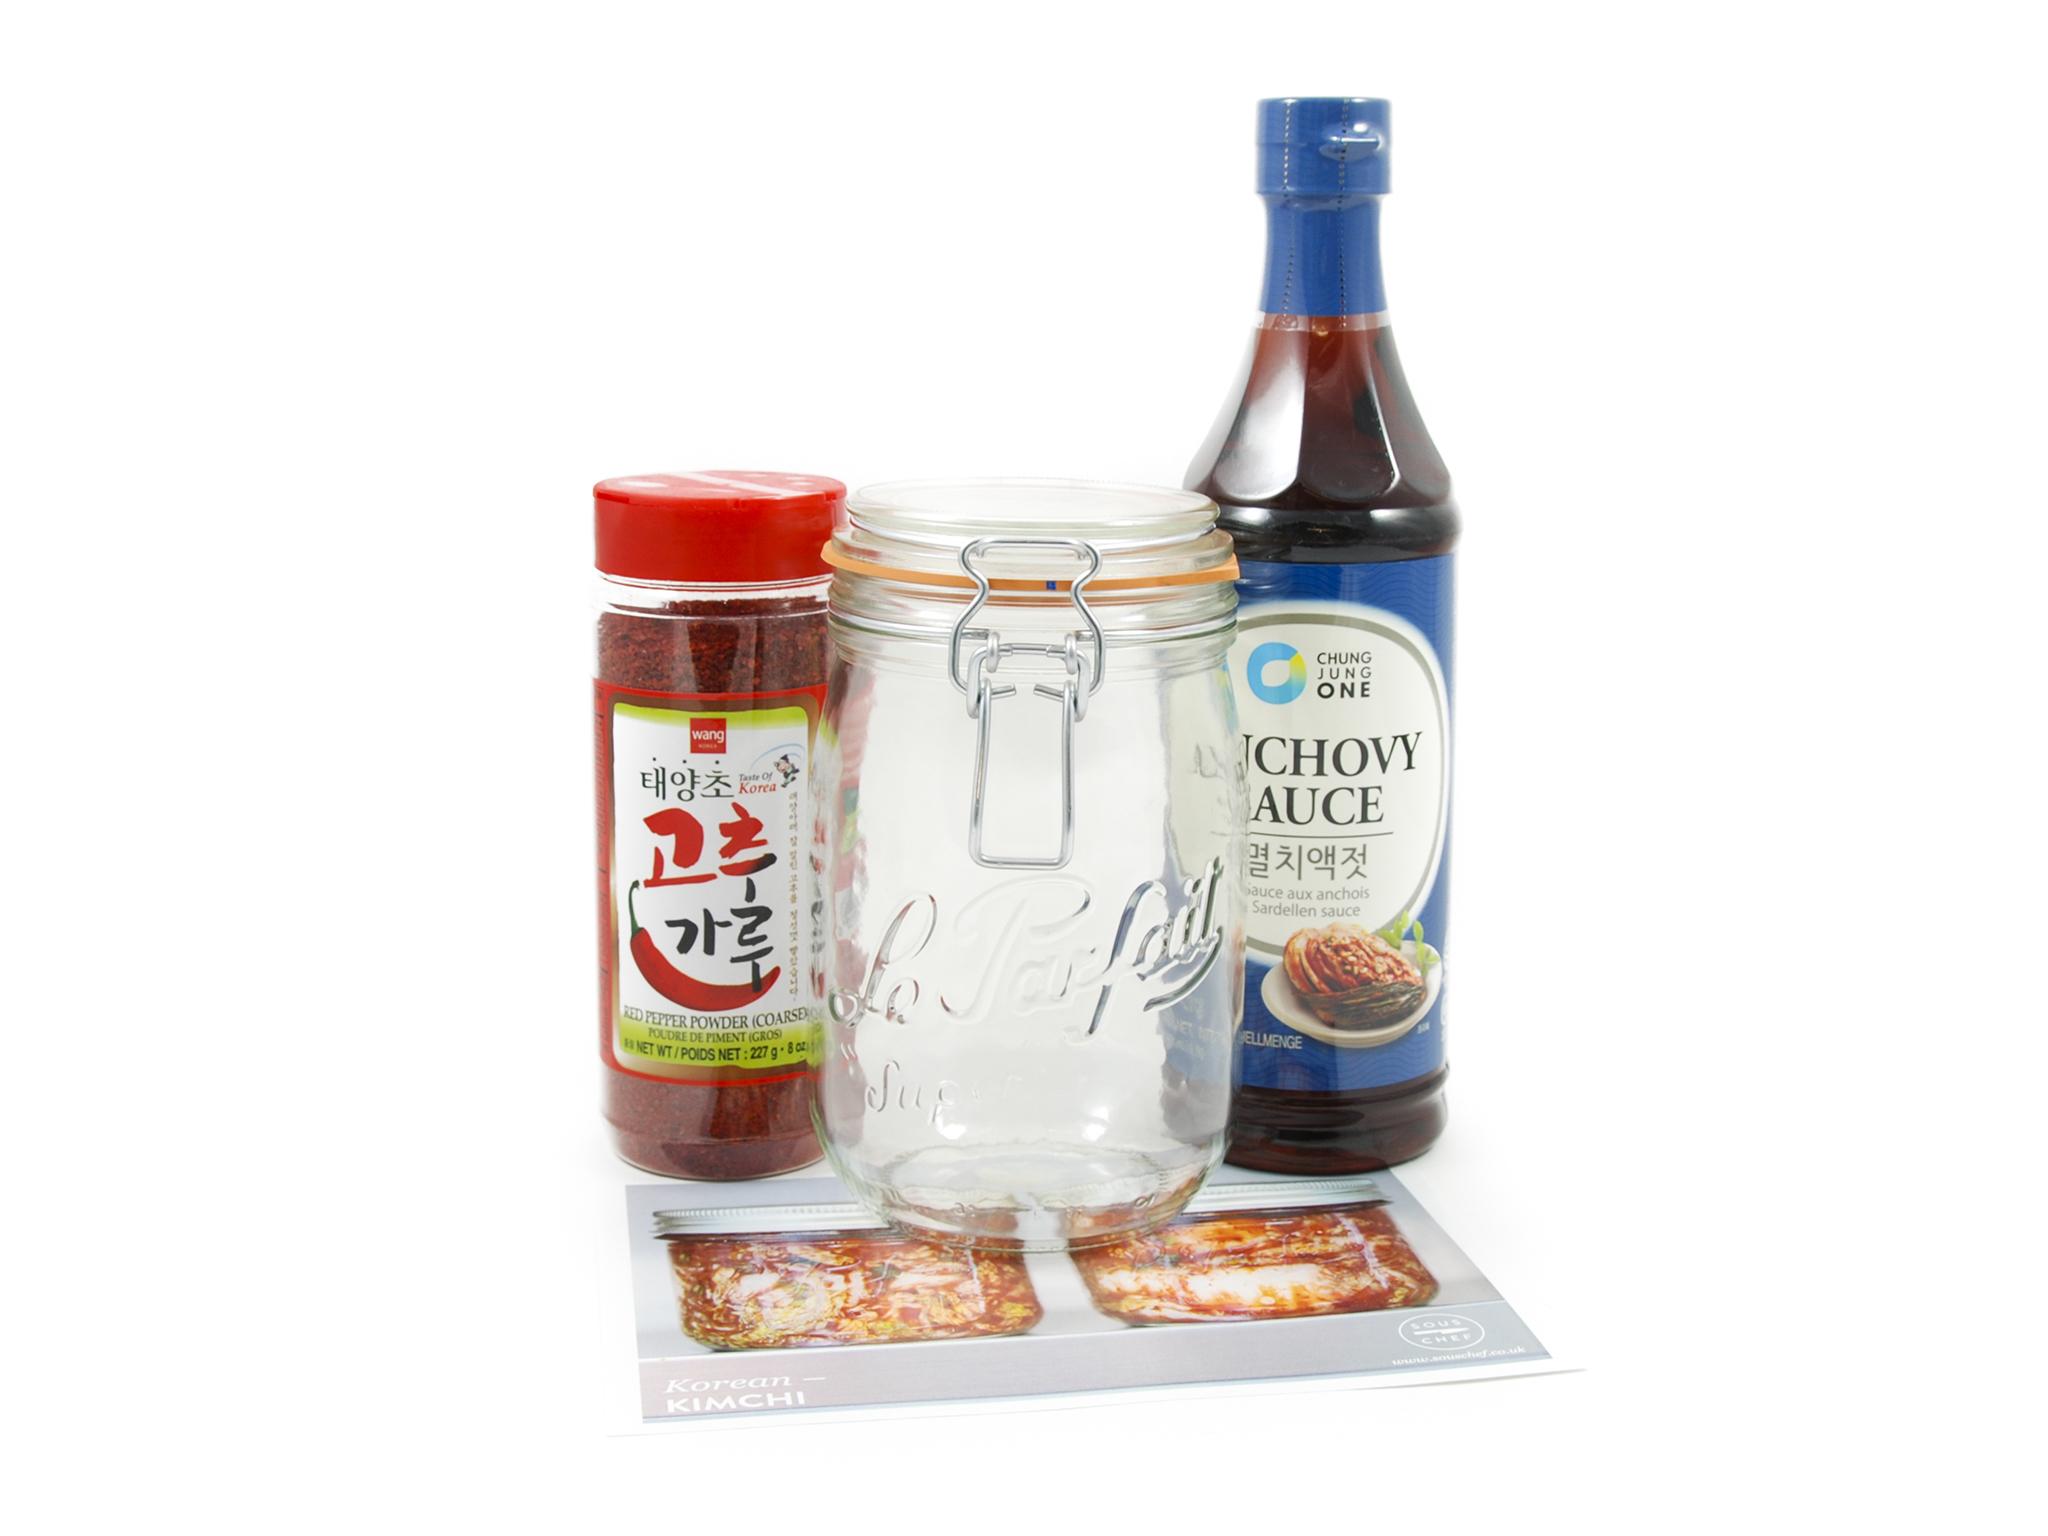 Kimchi making set